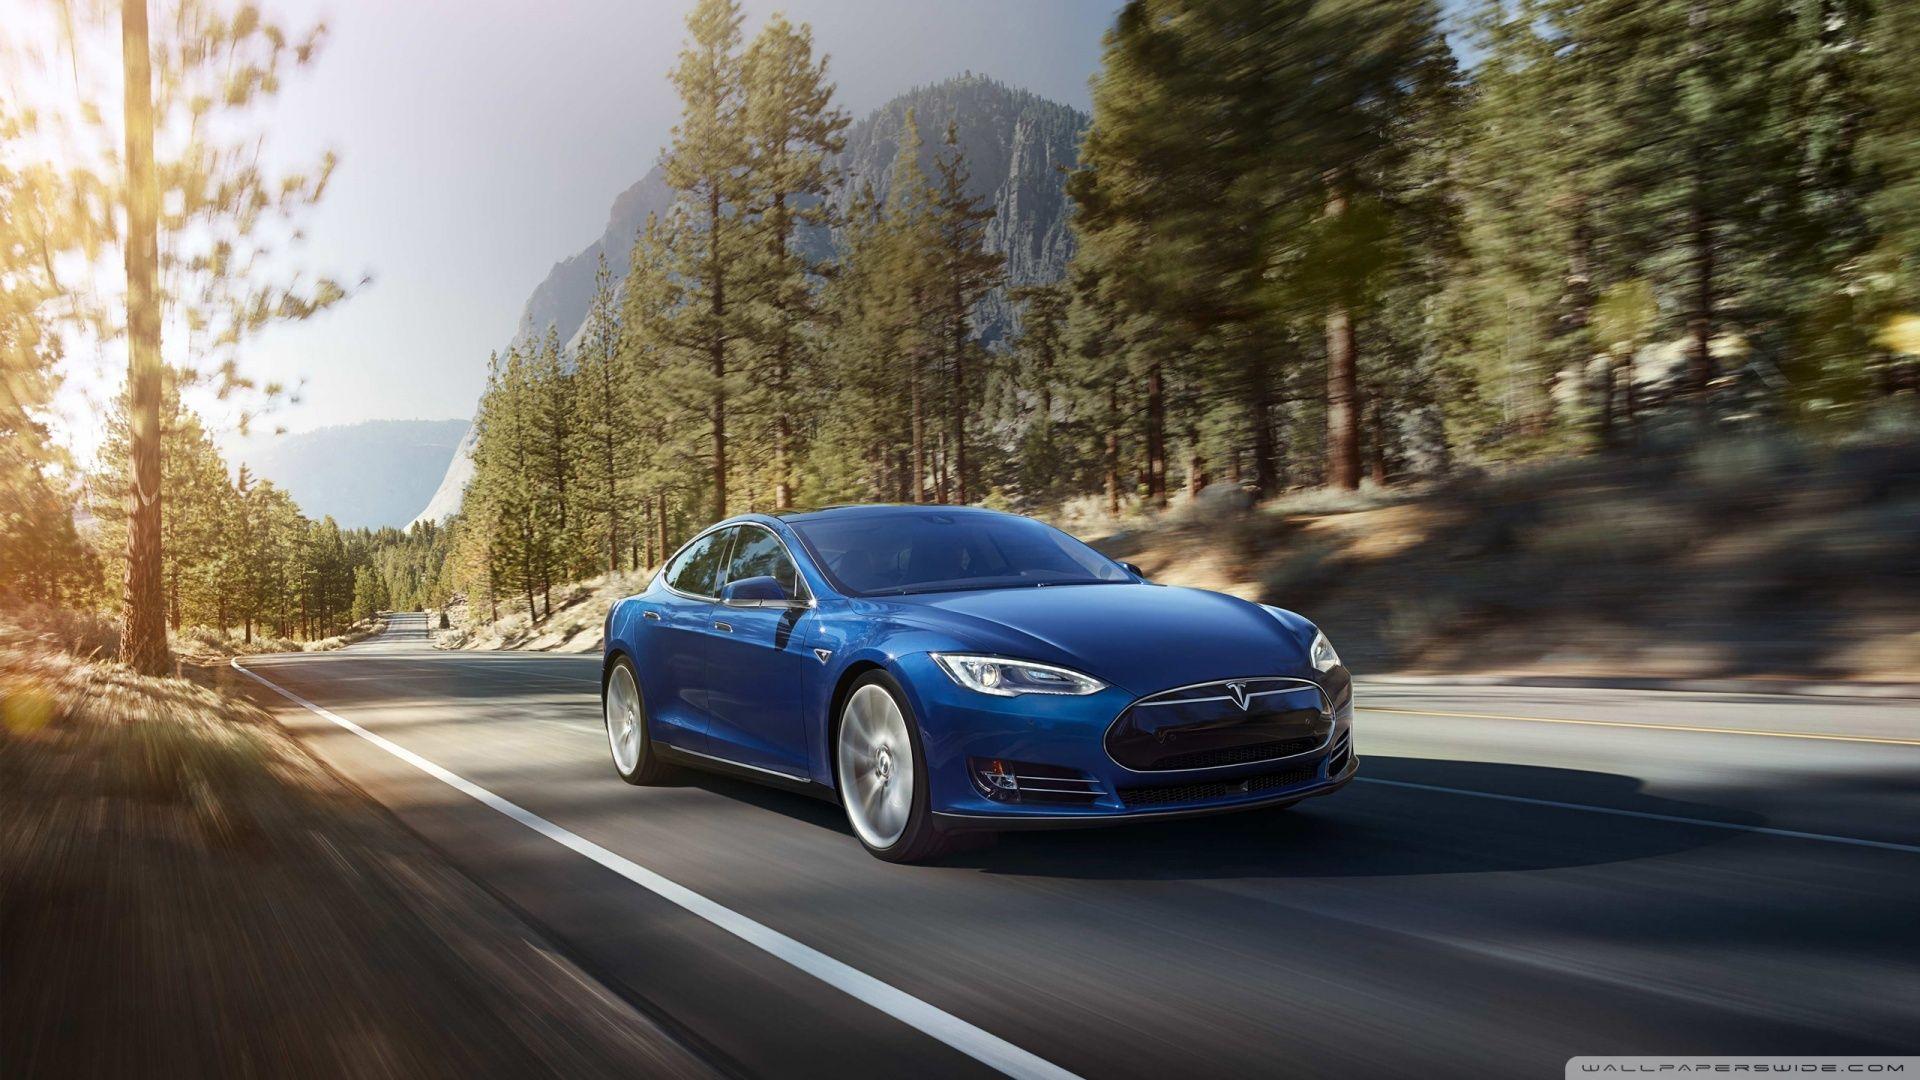 Tesla Wallpapers Top Free Tesla Backgrounds Wallpaperaccess